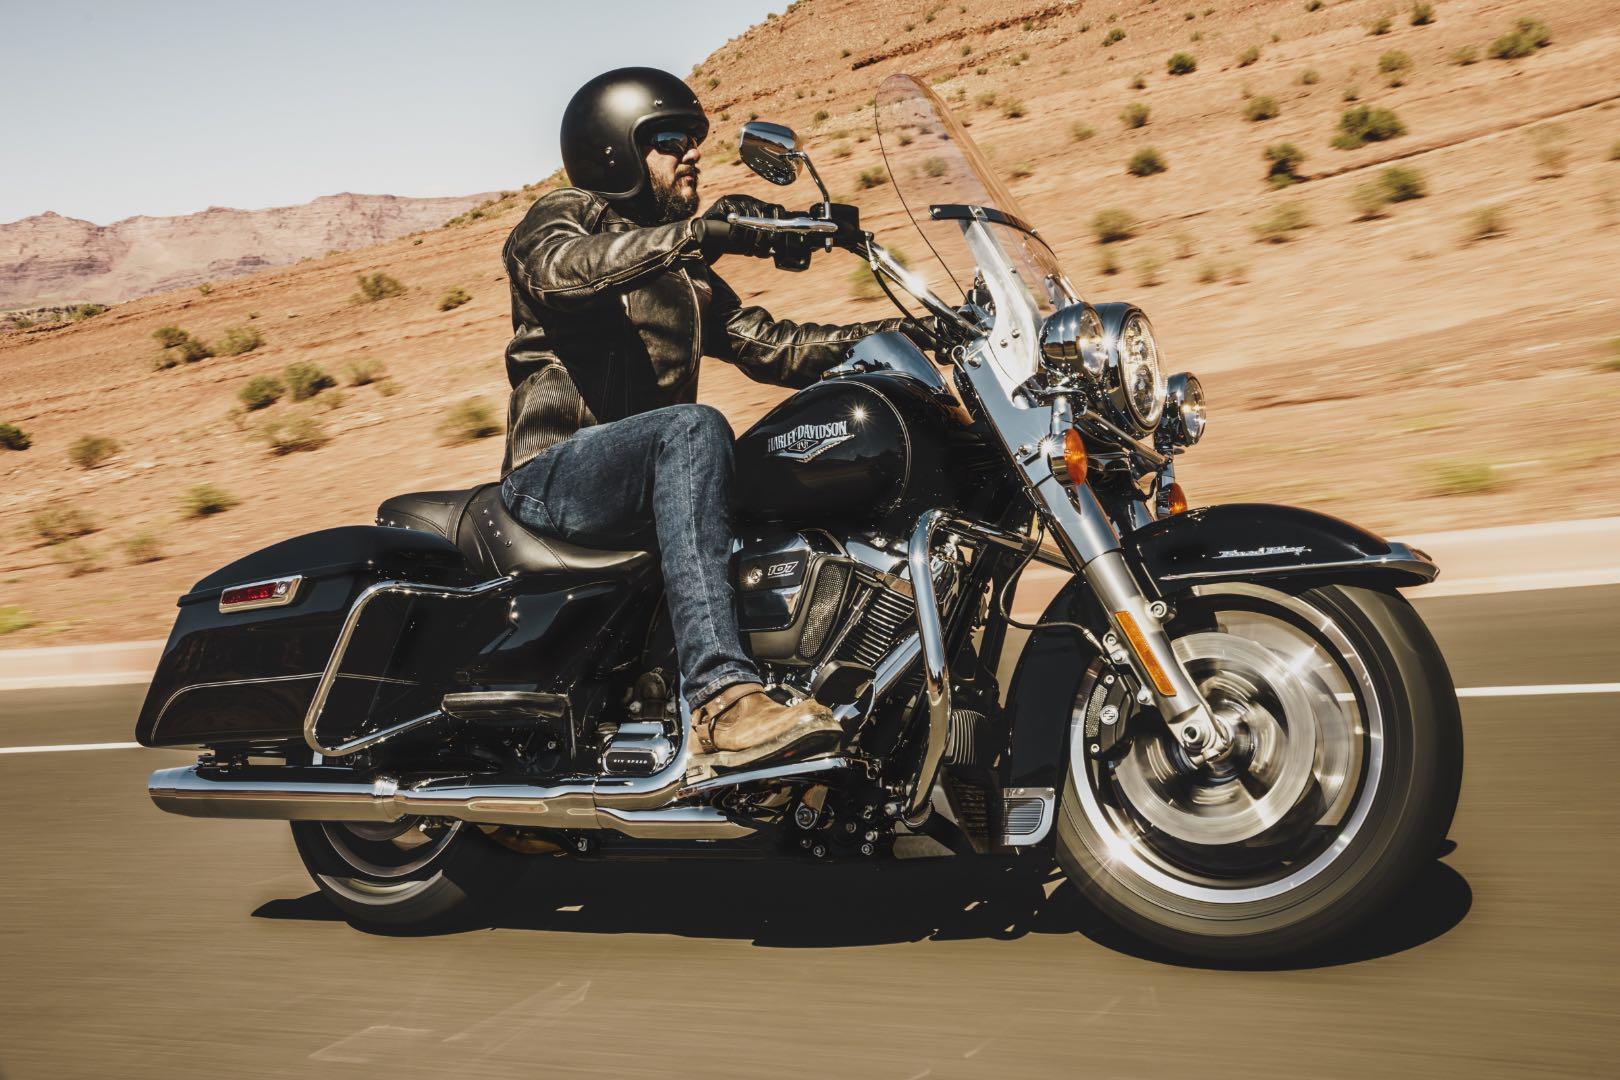 2017 Harley-Davidson Road King Buyer's Guide | Specs & Price